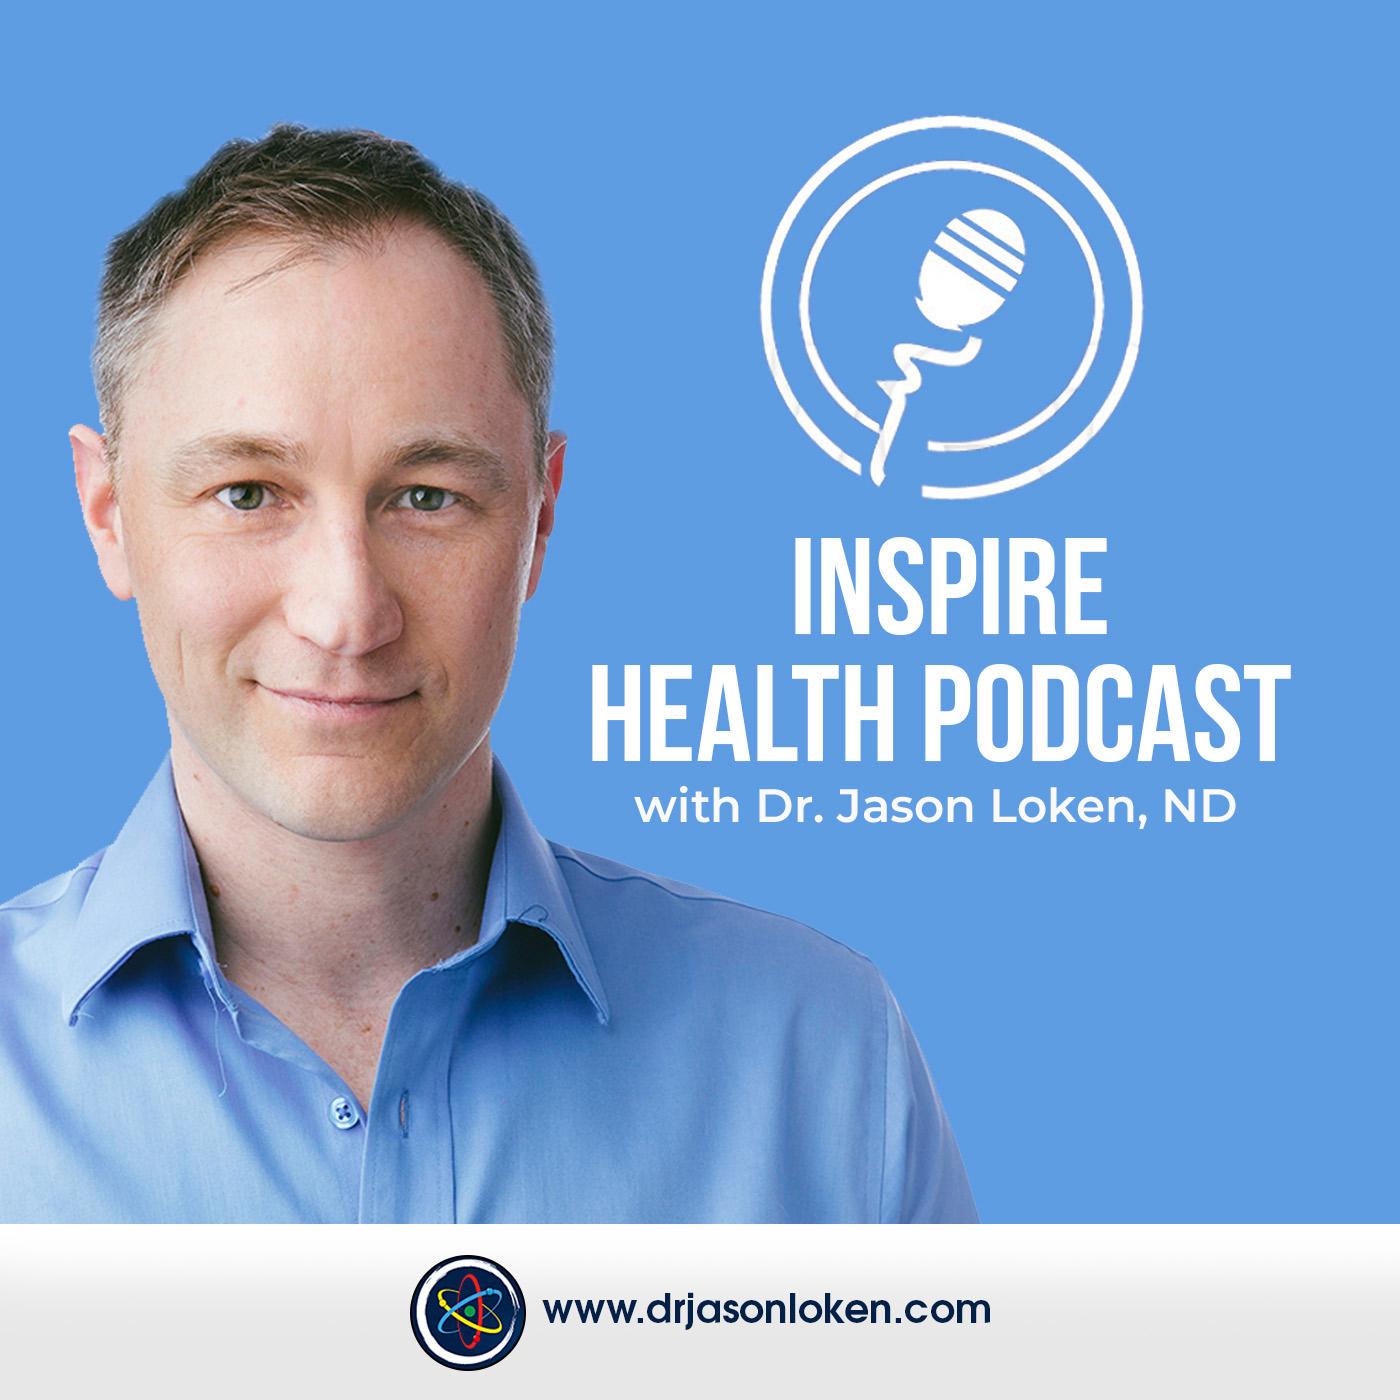 Inspire Health Podcast show art